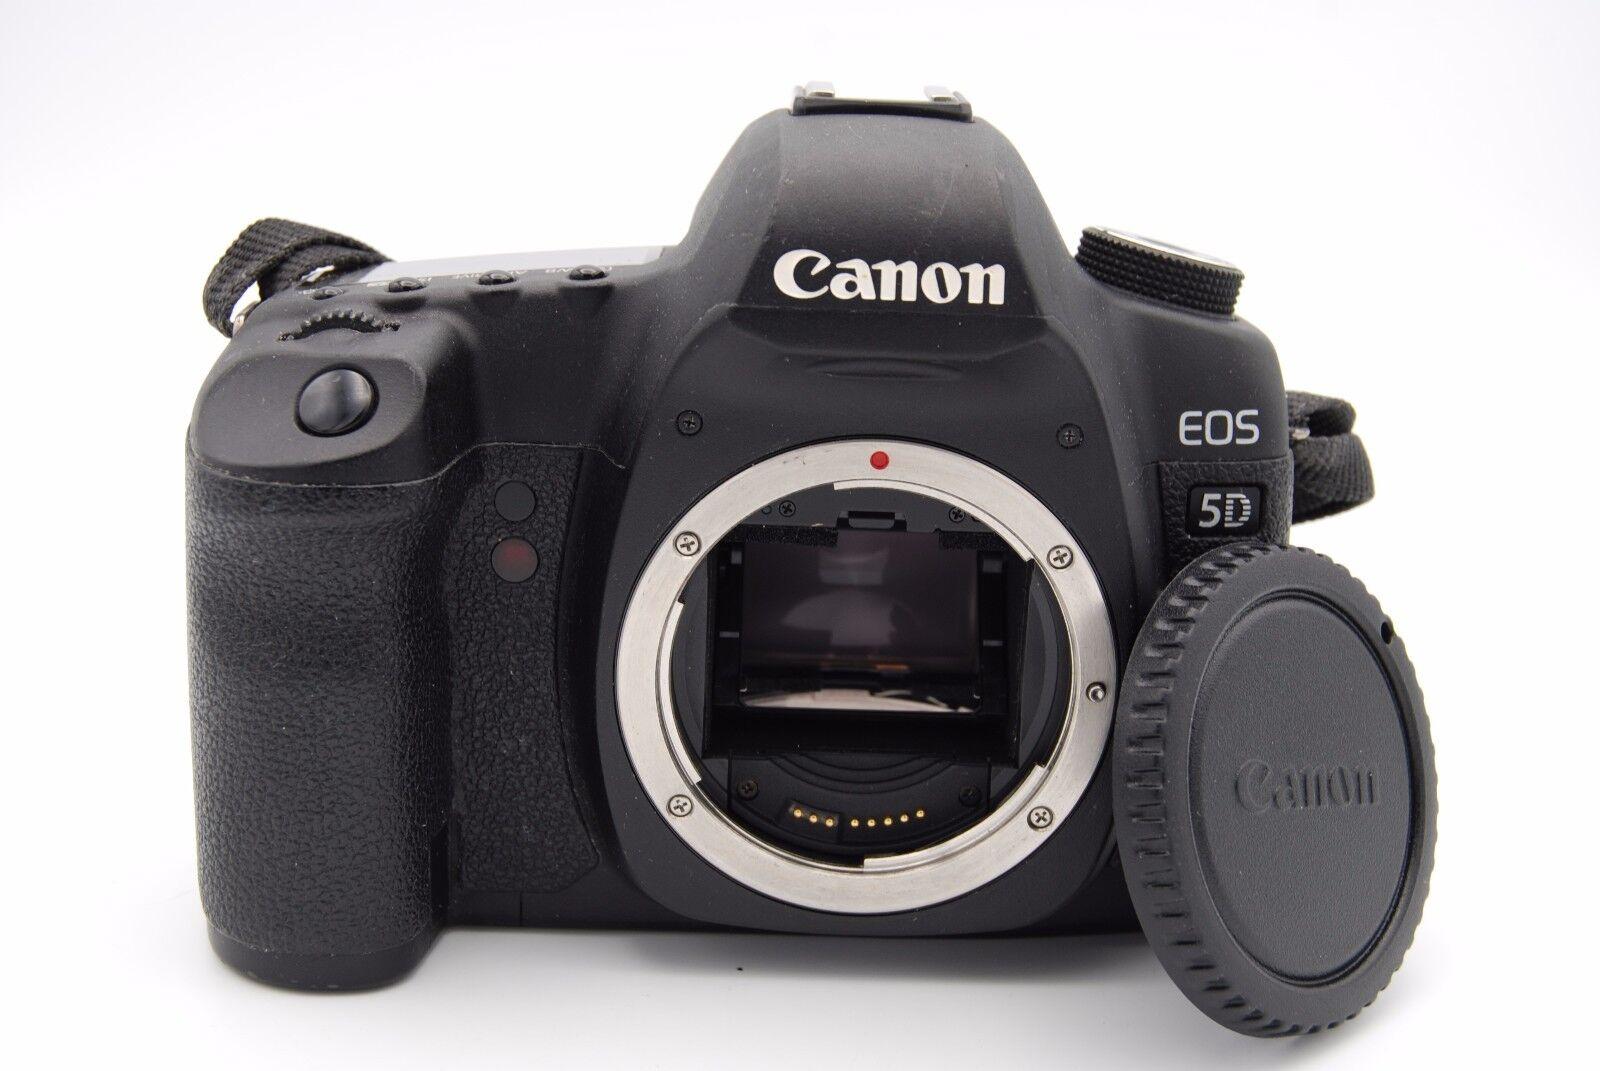 Canon eos 5d mark ii 3 39 39 screen dslr camera body for Canon 5d mark ii price